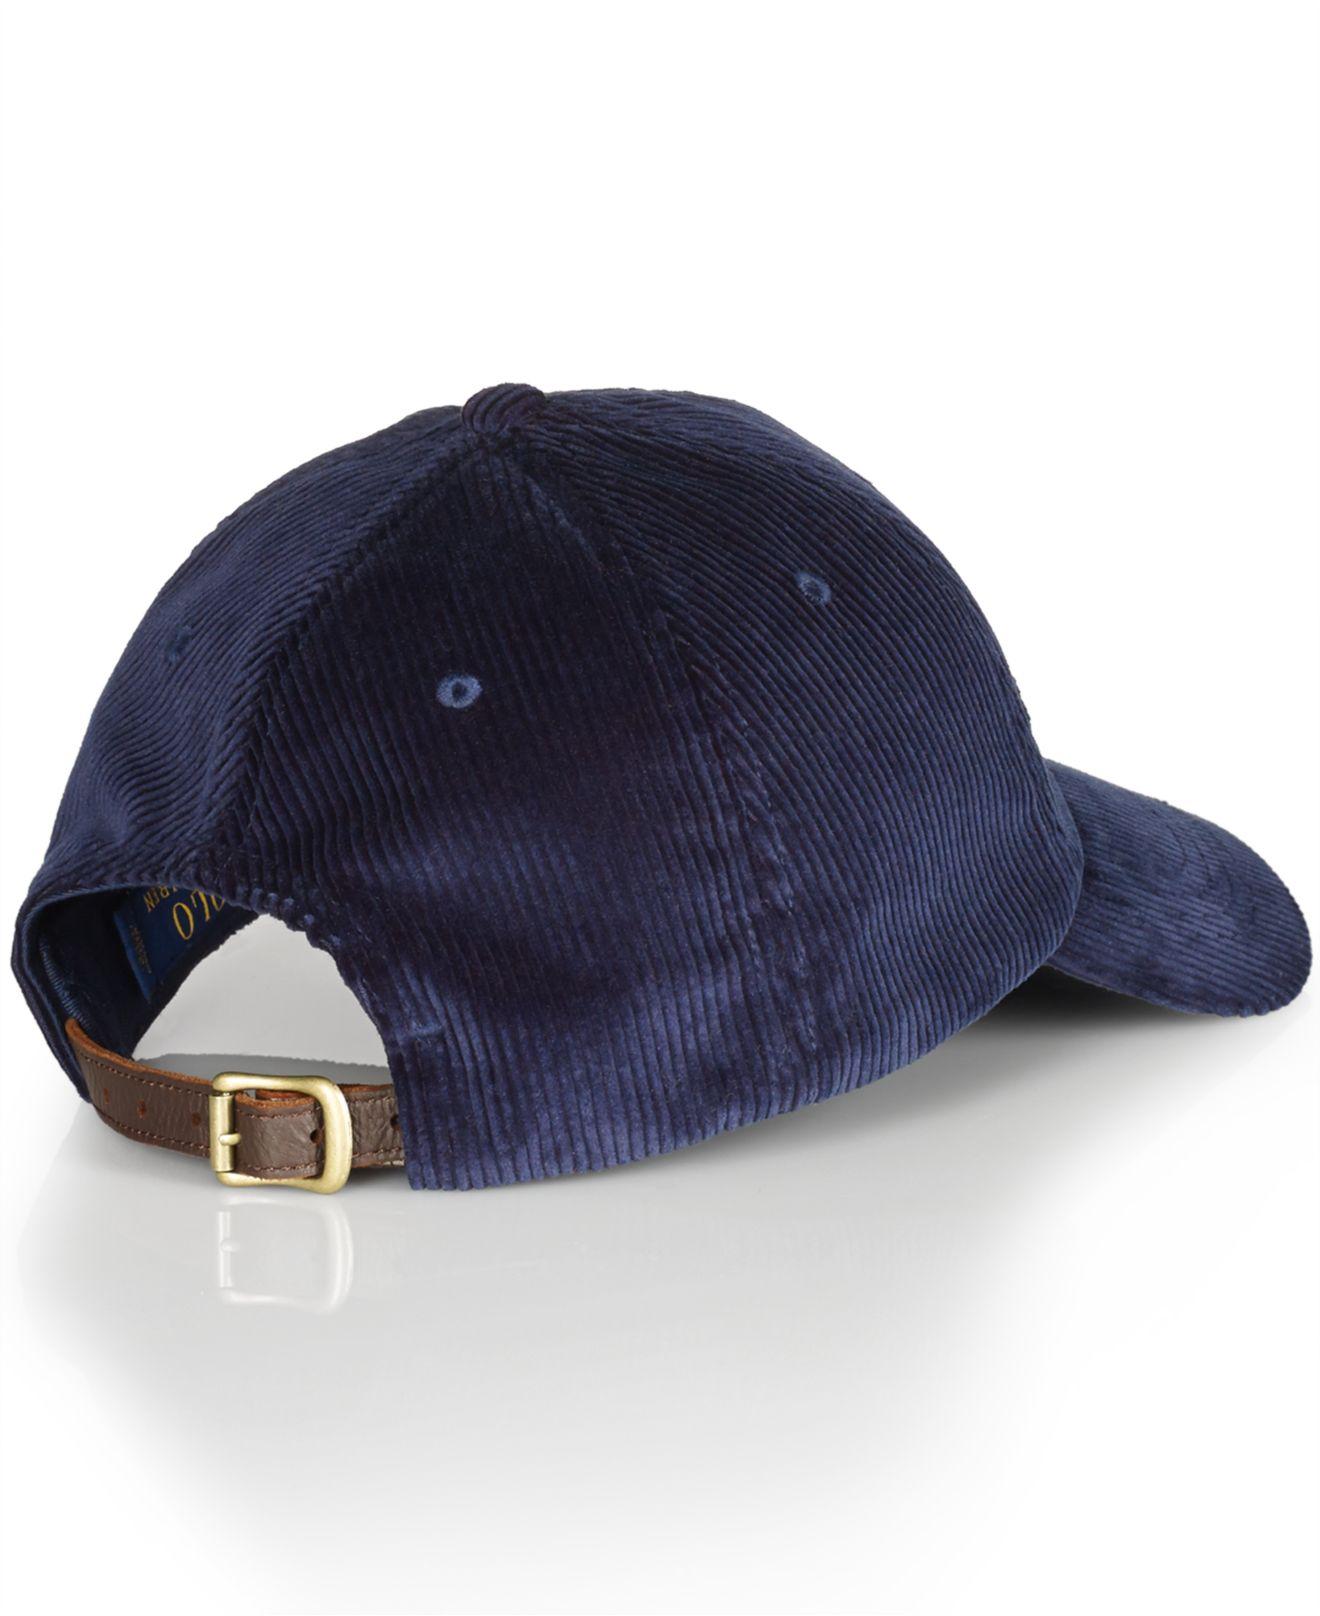 Lyst - Polo Ralph Lauren Corduroy Sports Cap in Blue for Men 83a63151b50